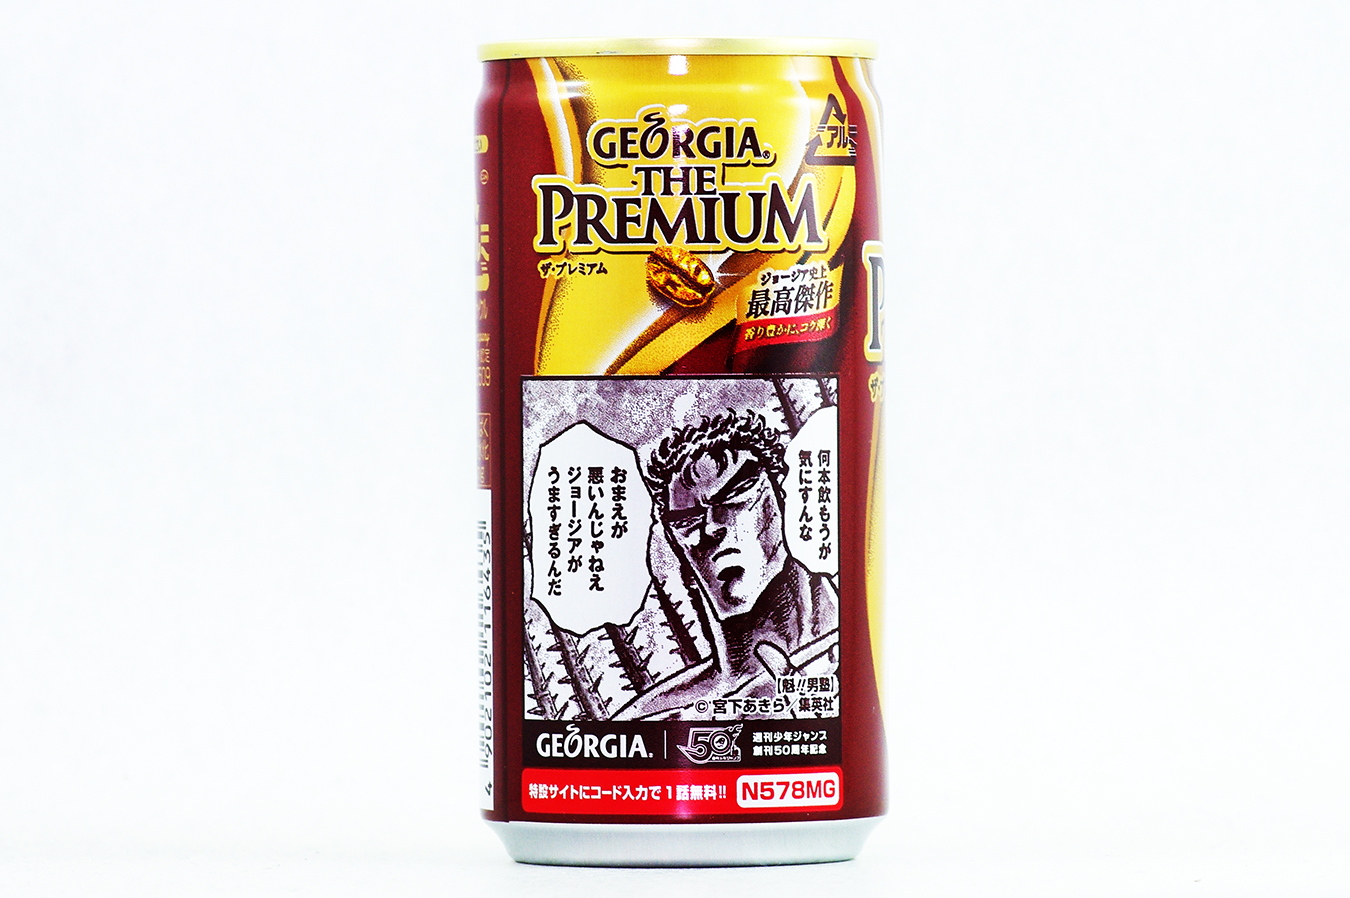 GEORGIA ザ・プレミアム 週刊少年ジャンプ創刊50周年記念缶 【魁!!男塾】 表面 2018年7月